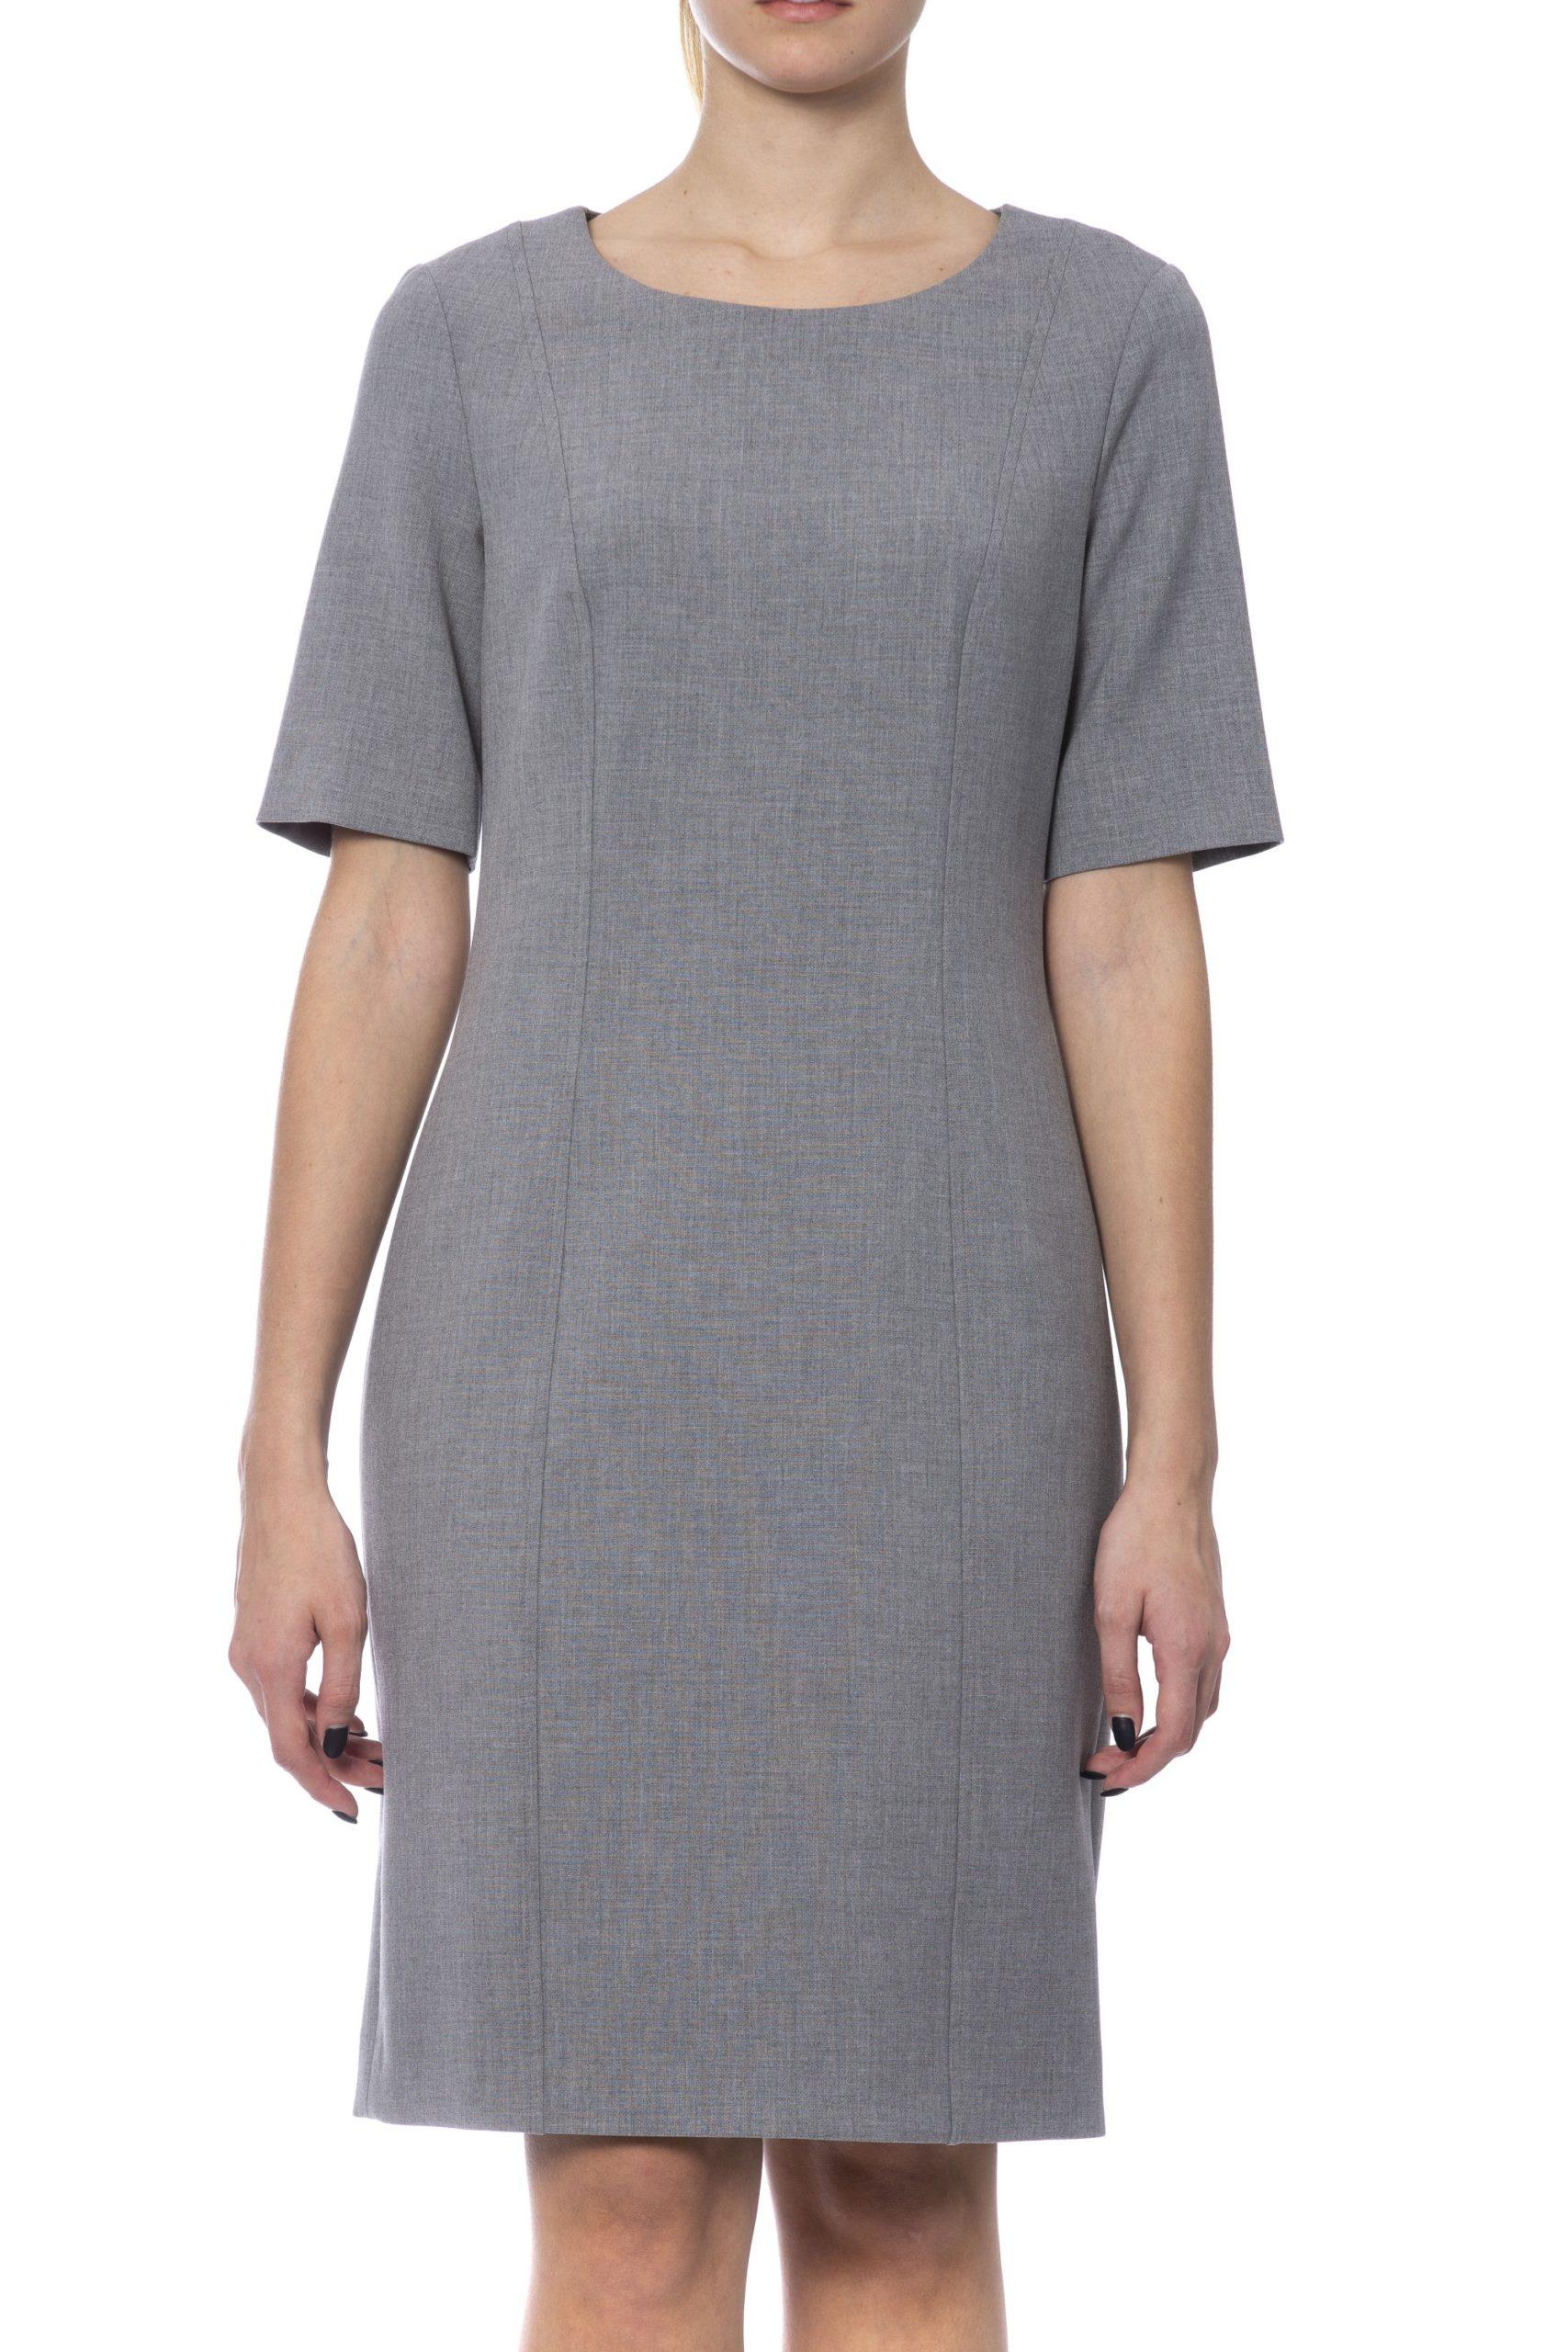 Peserico Women's Dress Grey PE993544 - IT42 | S